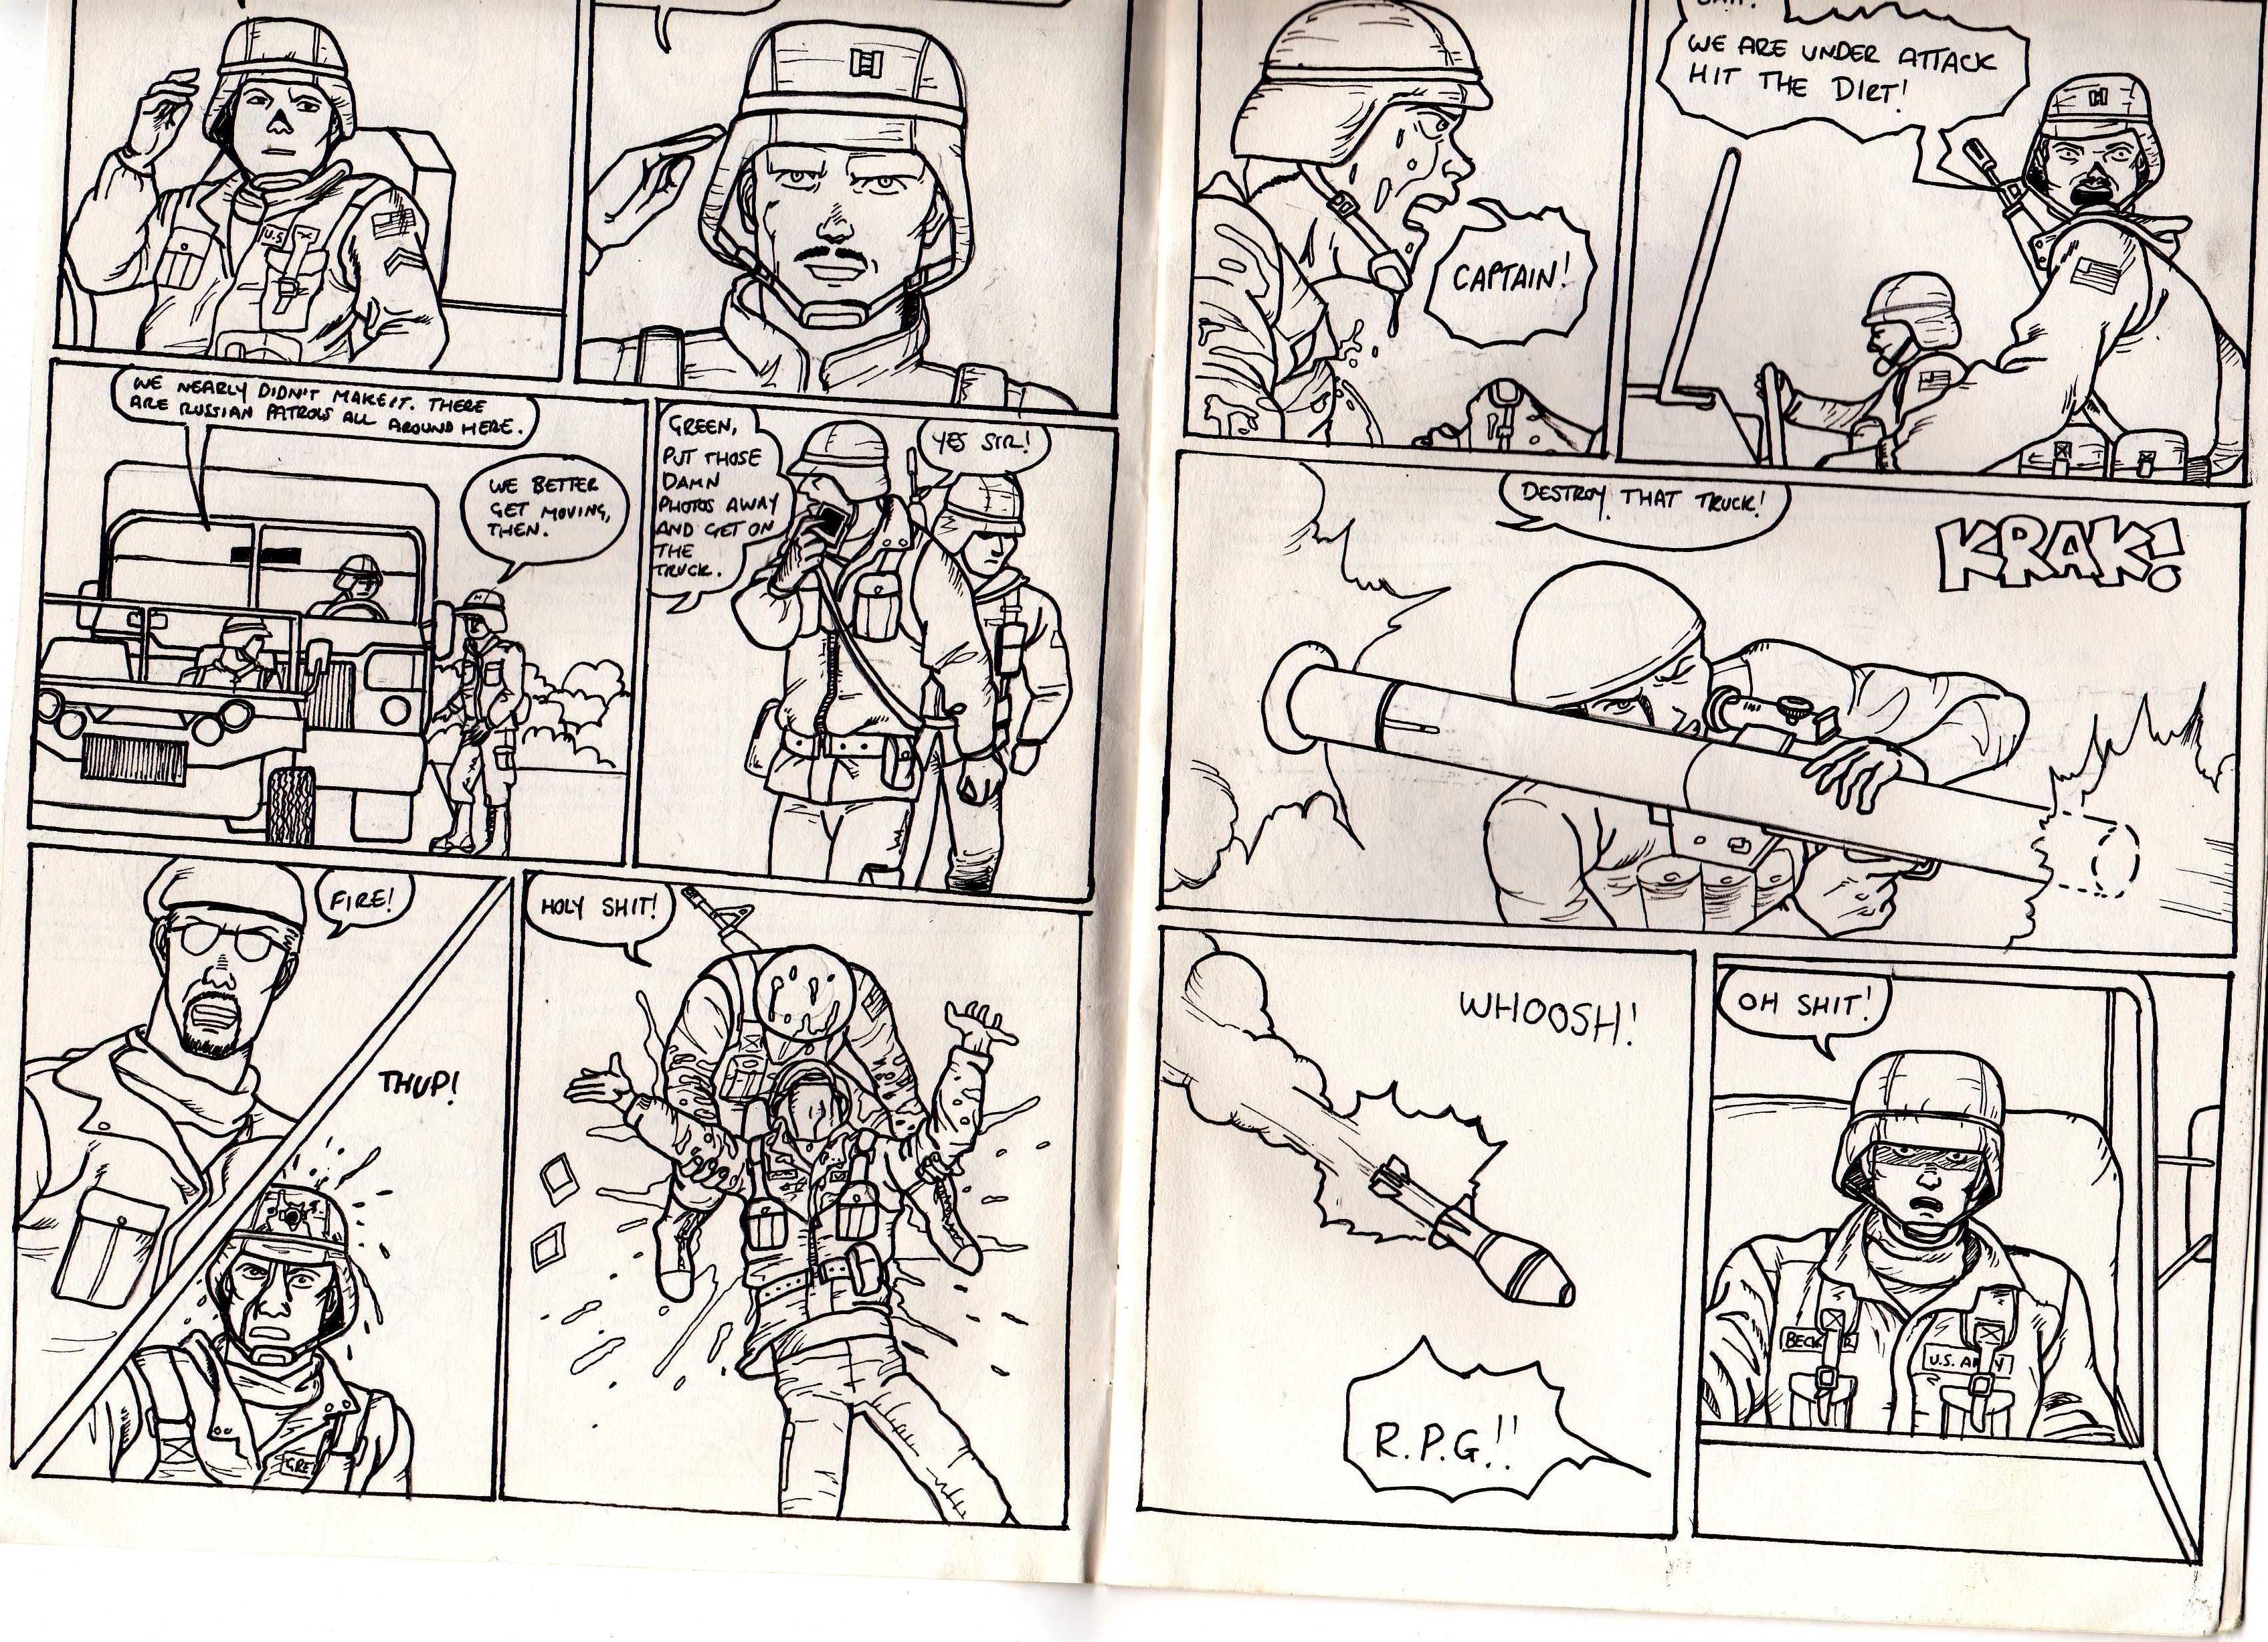 Drawn comic Comics not 3 Me see